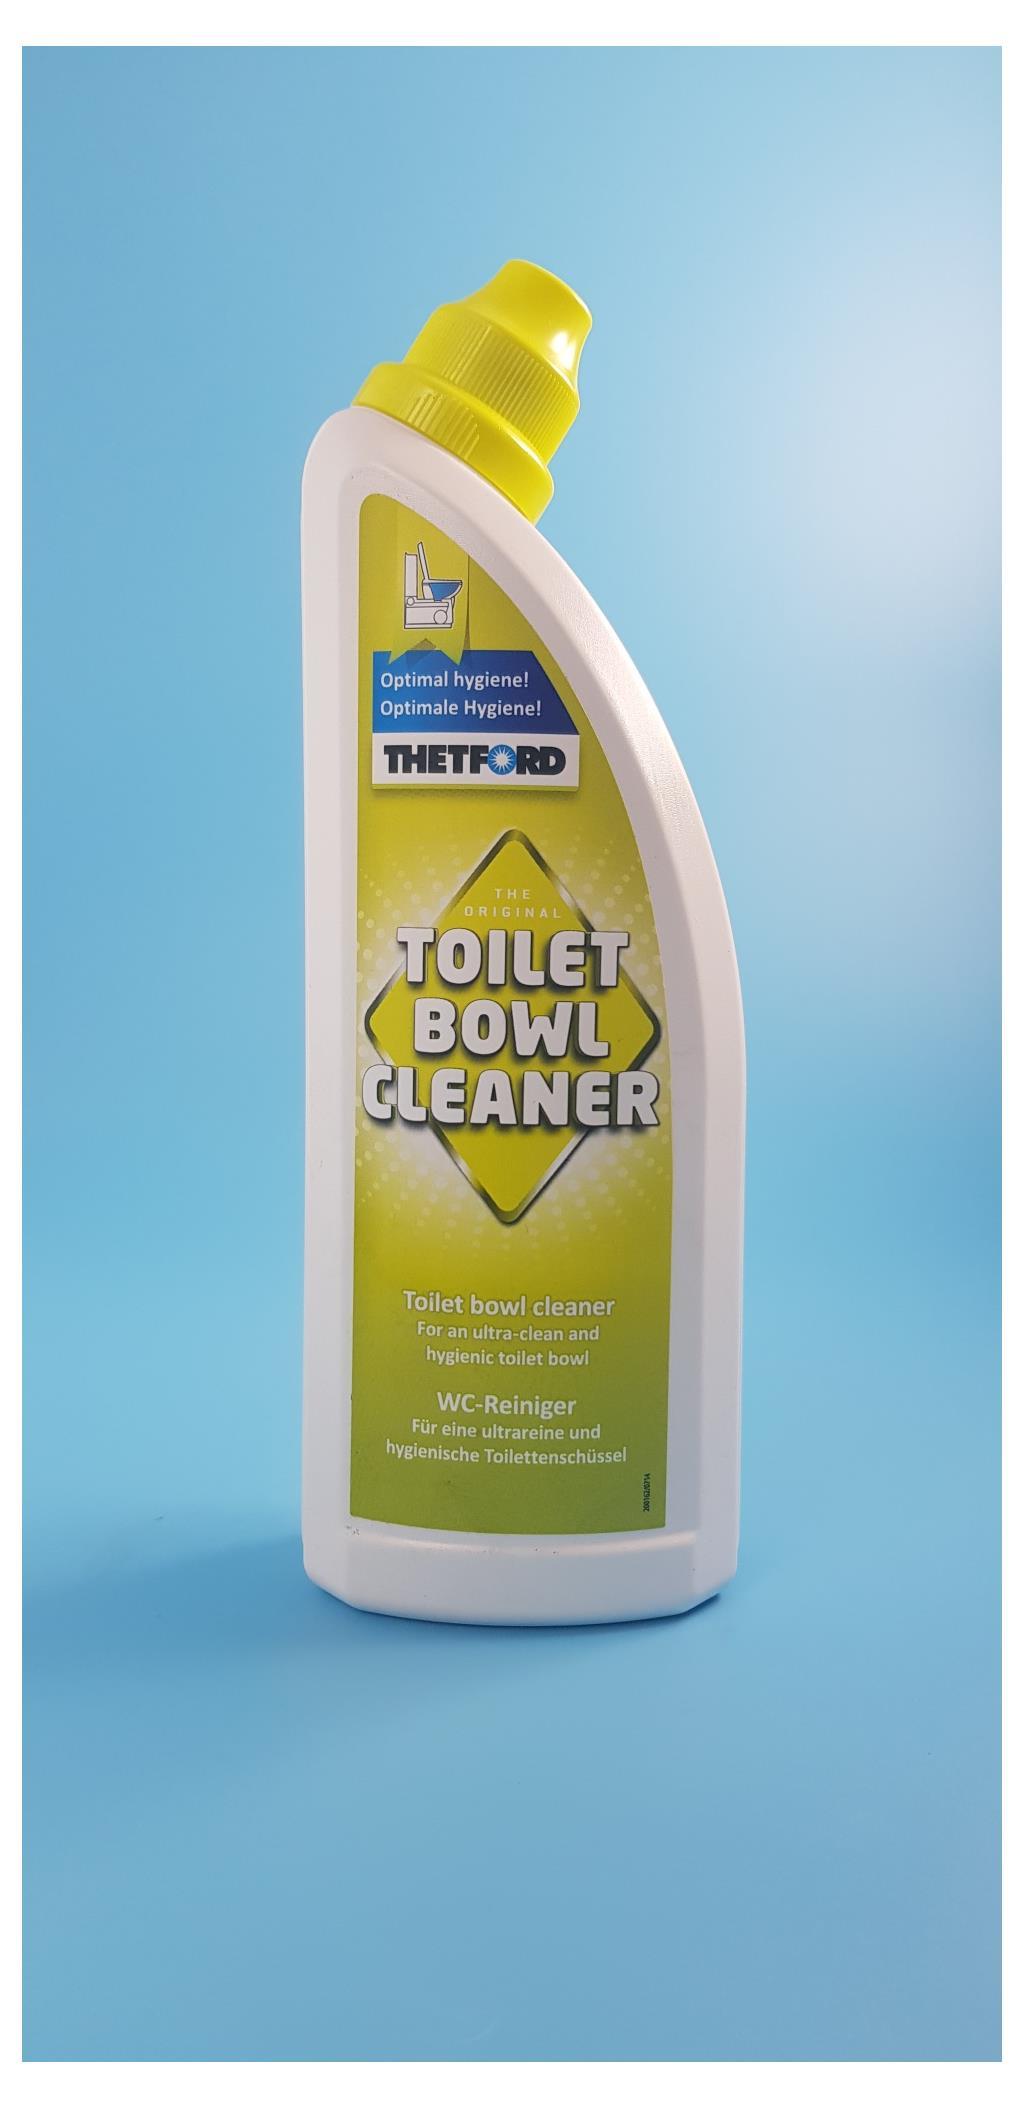 Thetford Toilet Bowl Cleaner - Image 0